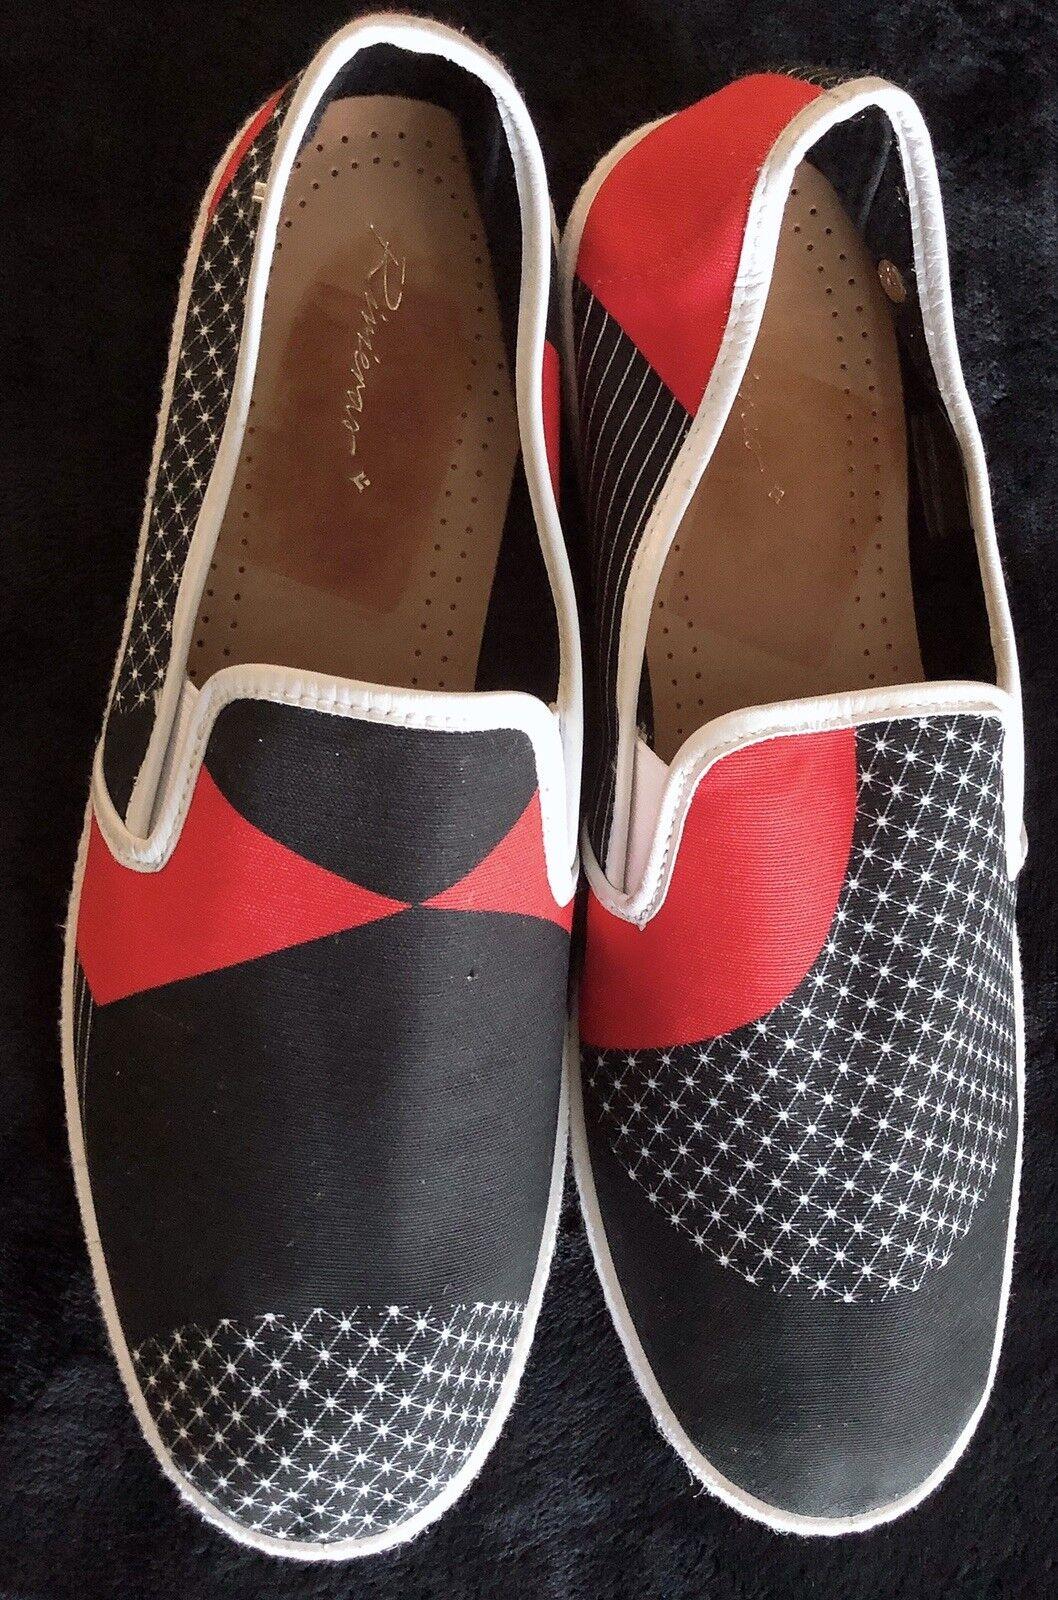 Venta especial 942236 201 Nike Air Max Flair Zapatillas de